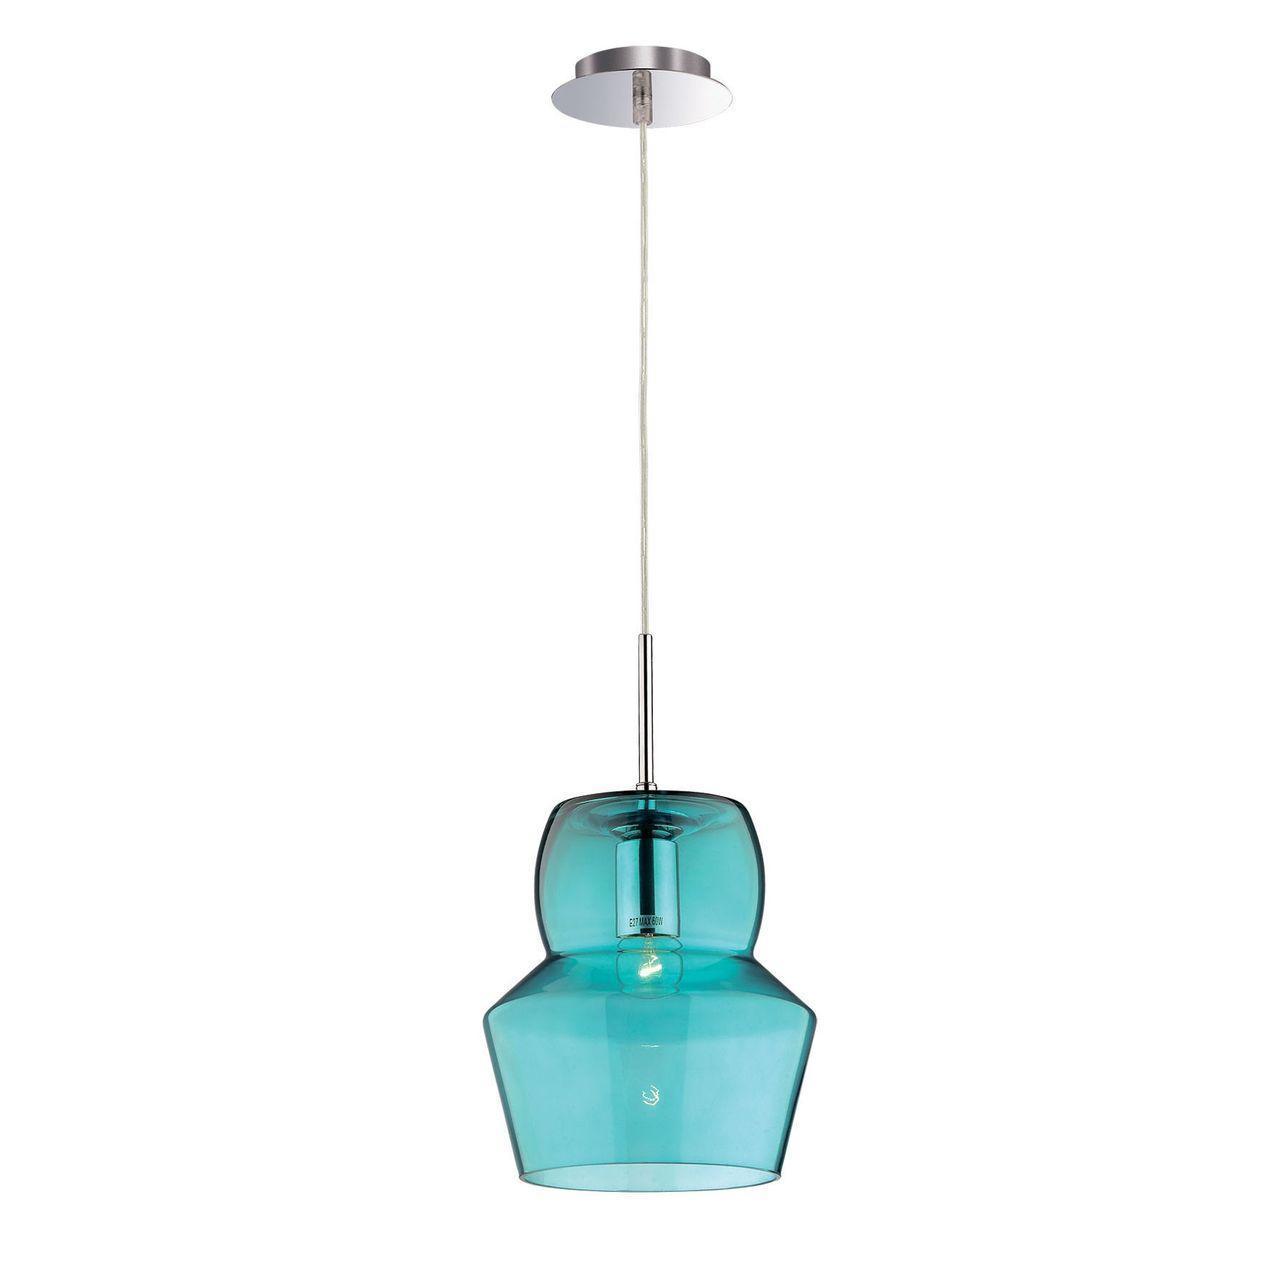 Подвесной светильник Ideal Lux Zeno SP1 Big Azzurro картина модульная milarte 80 х 125 см v 315